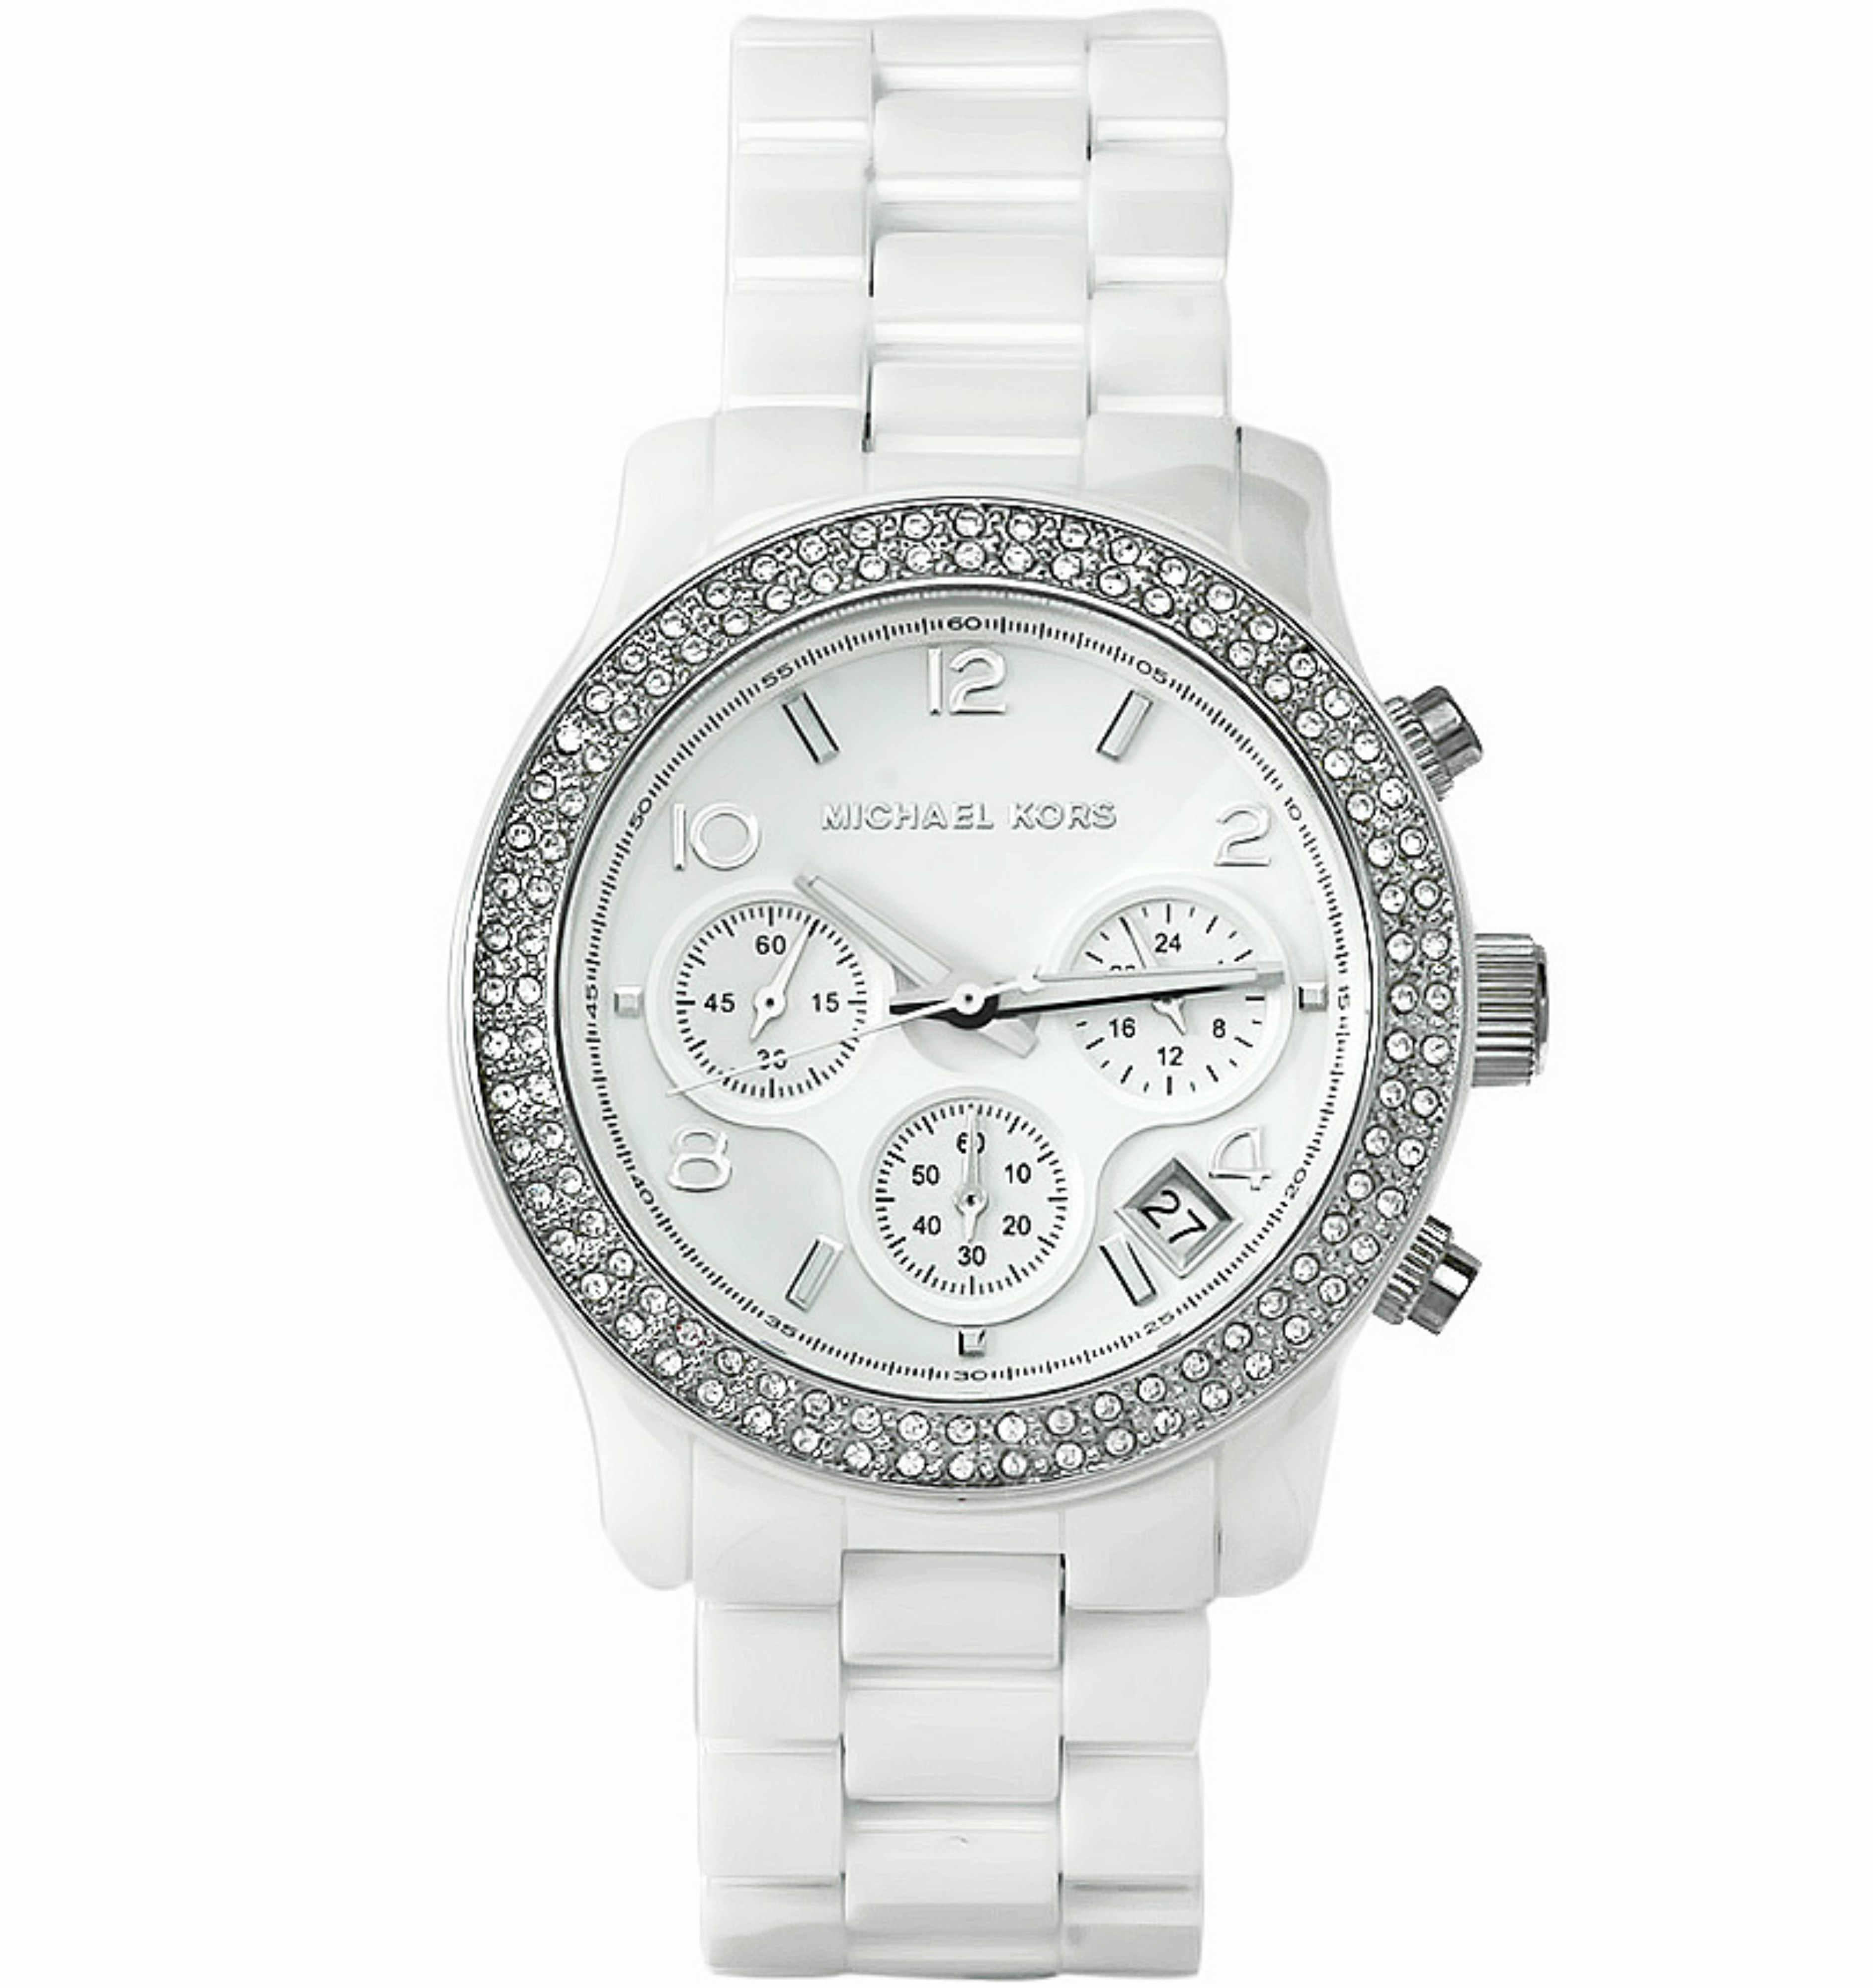 Michael Kors Runway Ladies White Ceramic Bracelet Chronograph Round Watch MK5188